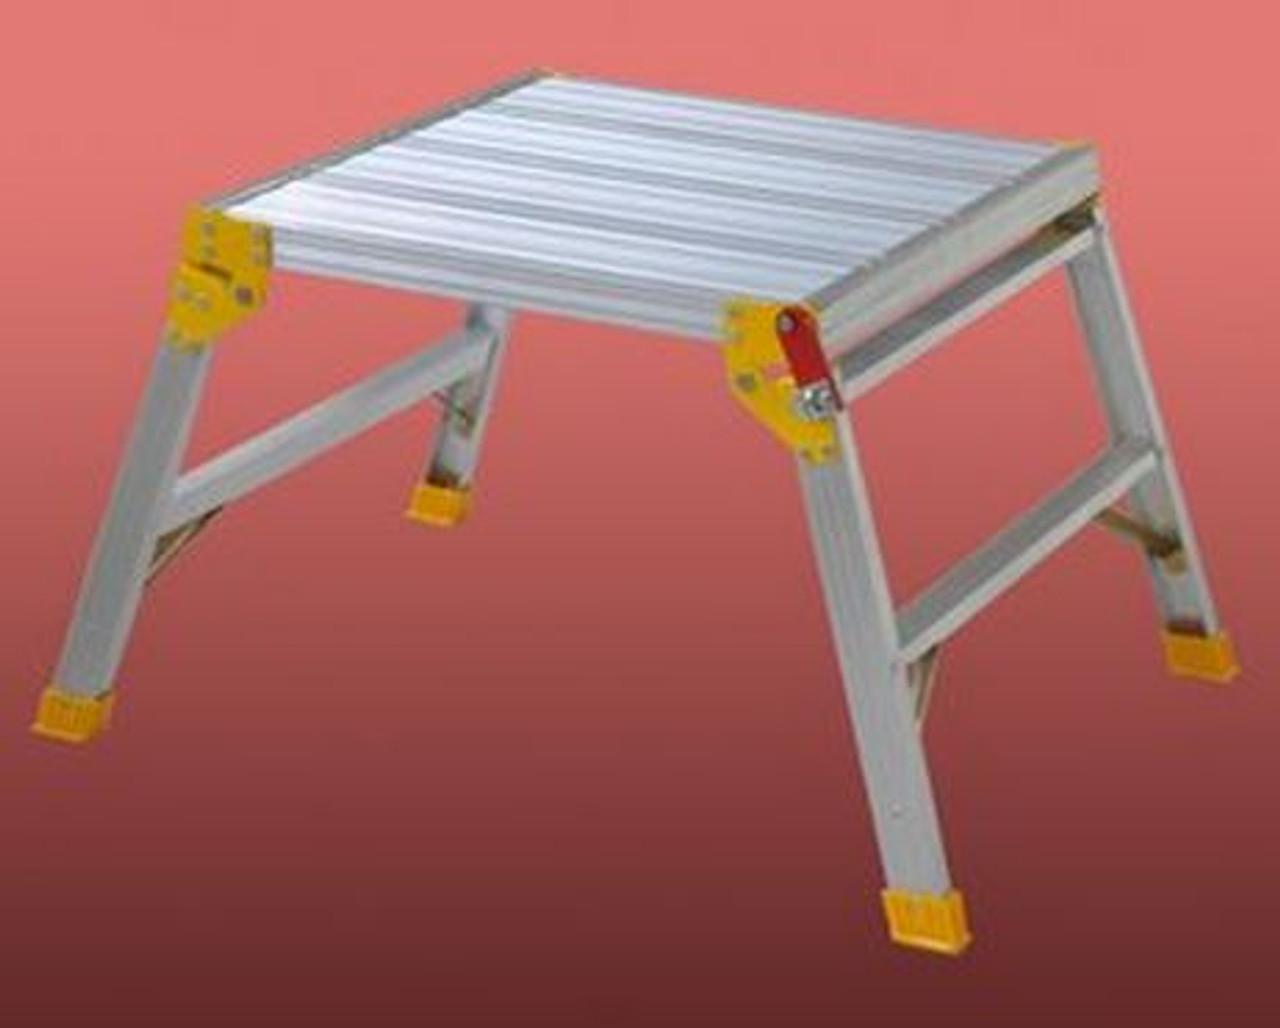 Indalex Work Platform Aluminium 120KG 600x600x500mm TRDWP60